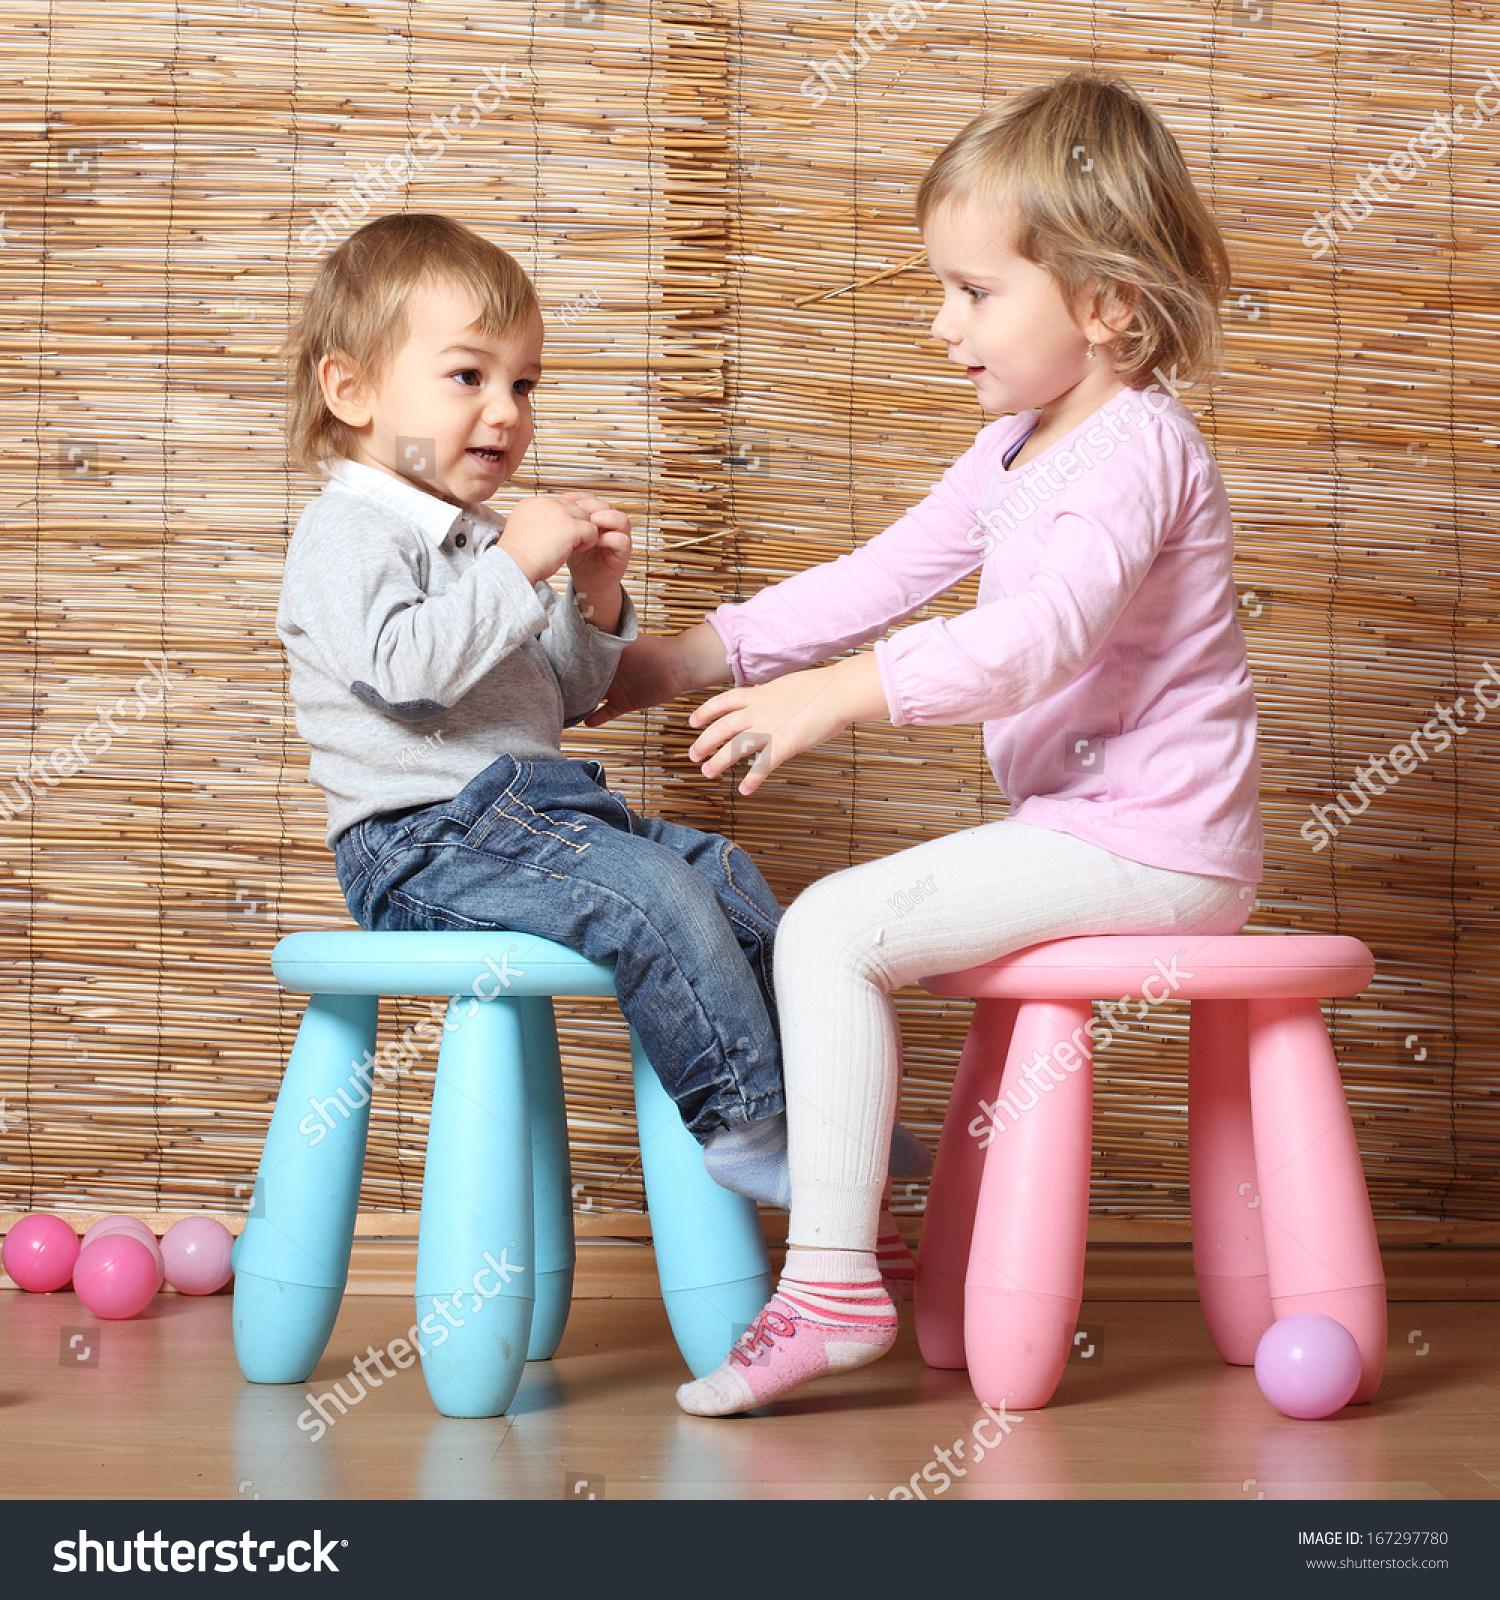 Siblings Talking Stock Photos & Siblings Talking Stock Images - Alamy